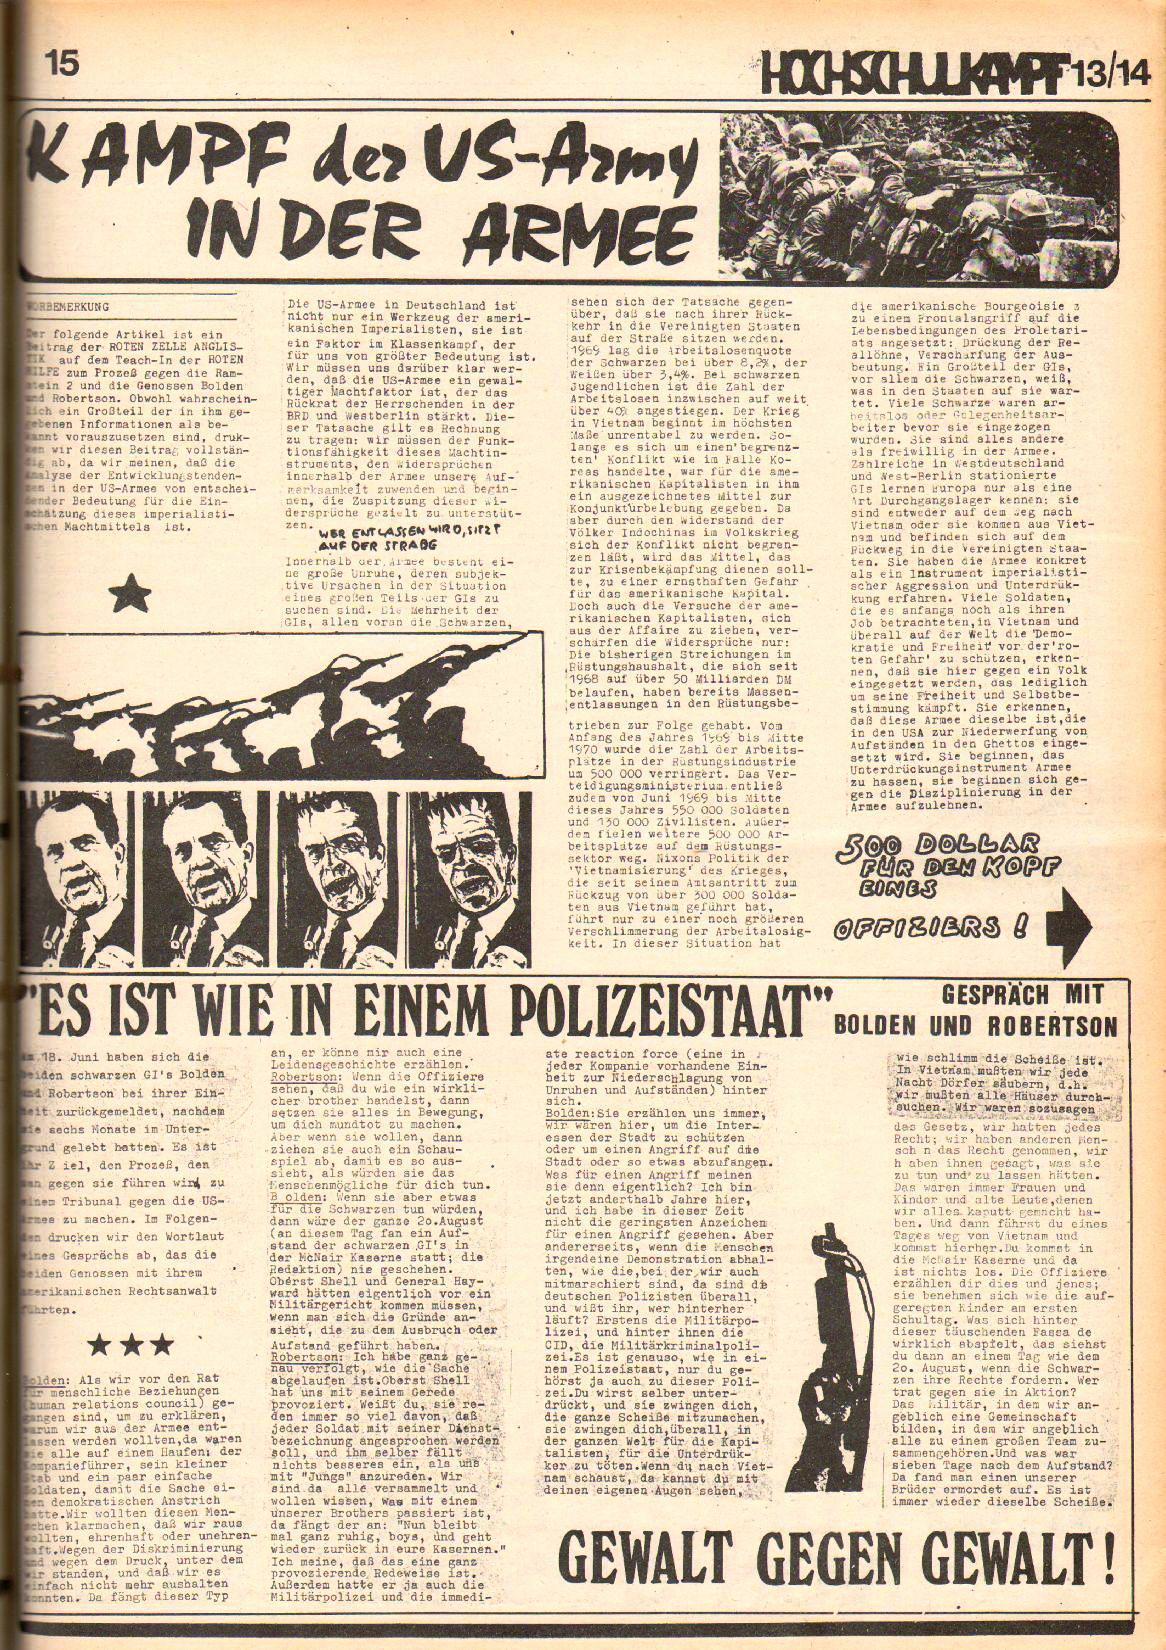 Berlin_Hochschulkampf_1971_13_16